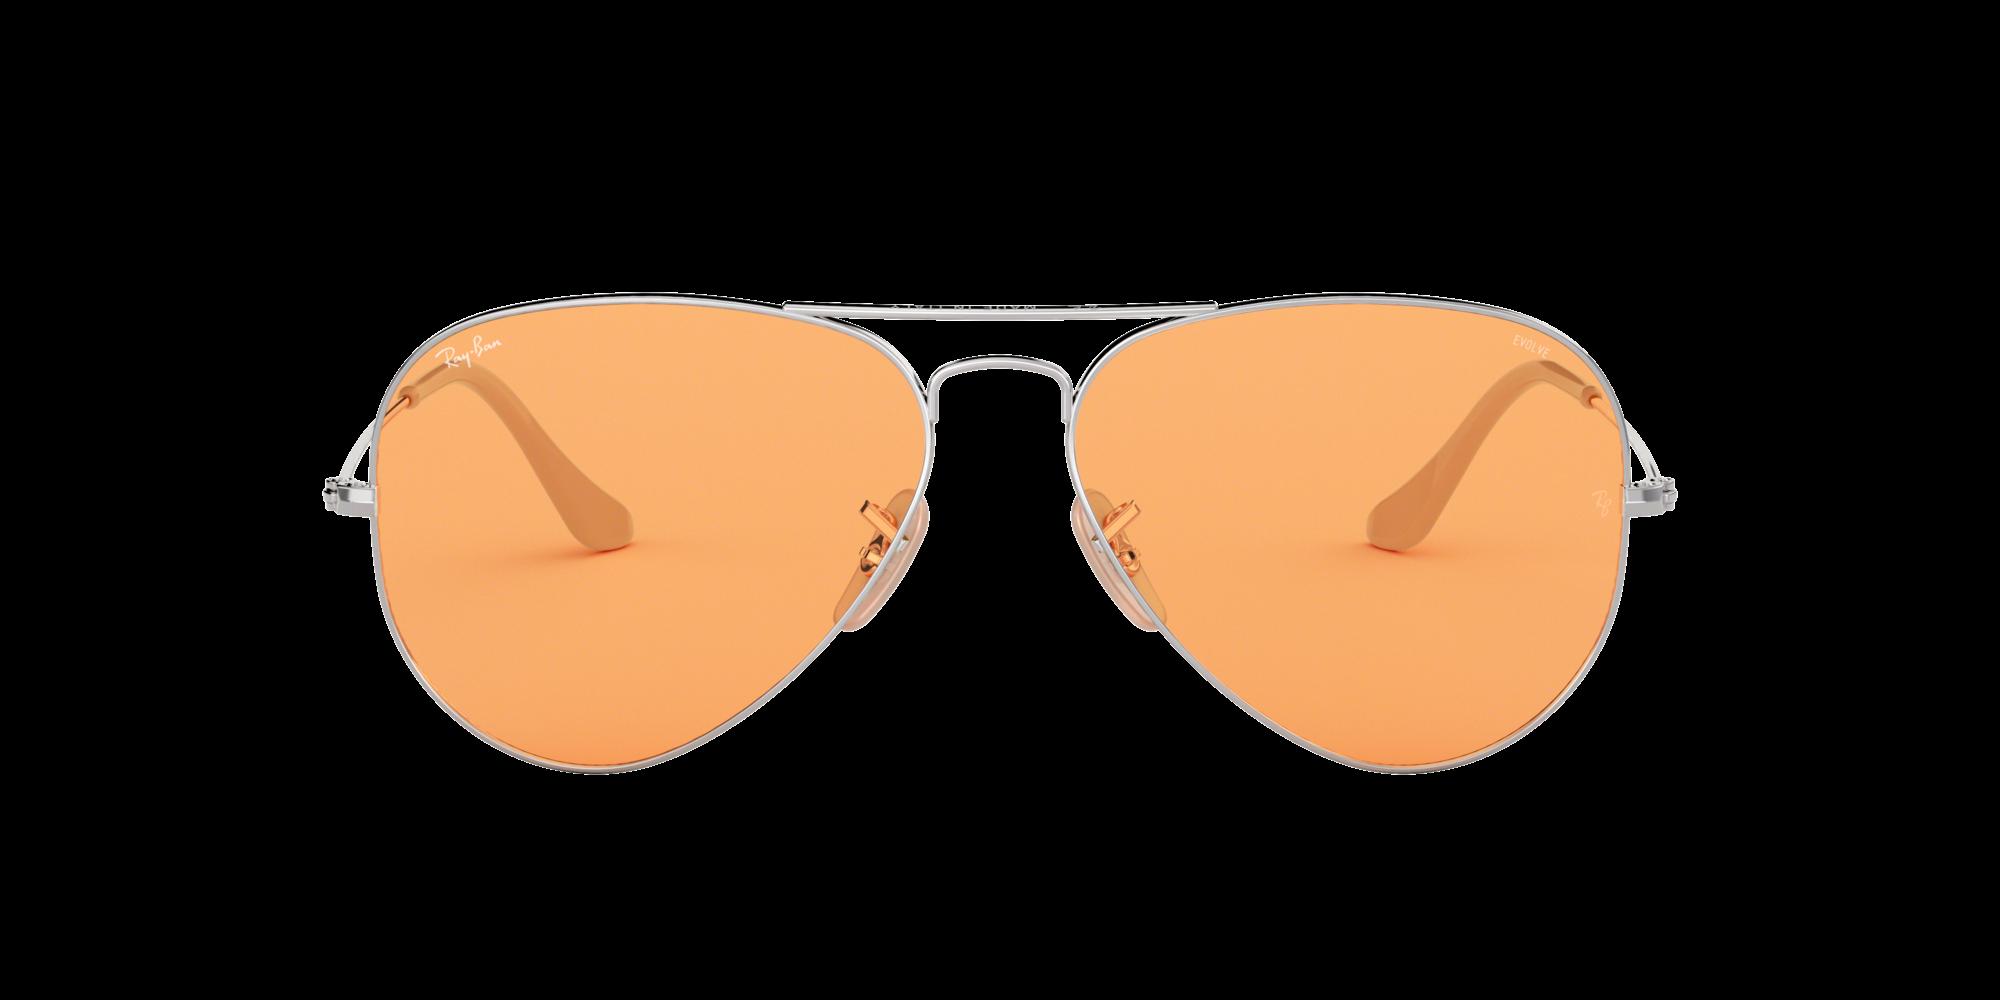 bf2ef46fe3 Sunglasses Ray-Ban Aviator Evolve Silver RB3025 9065 V9 55-14 Small  Photochromic